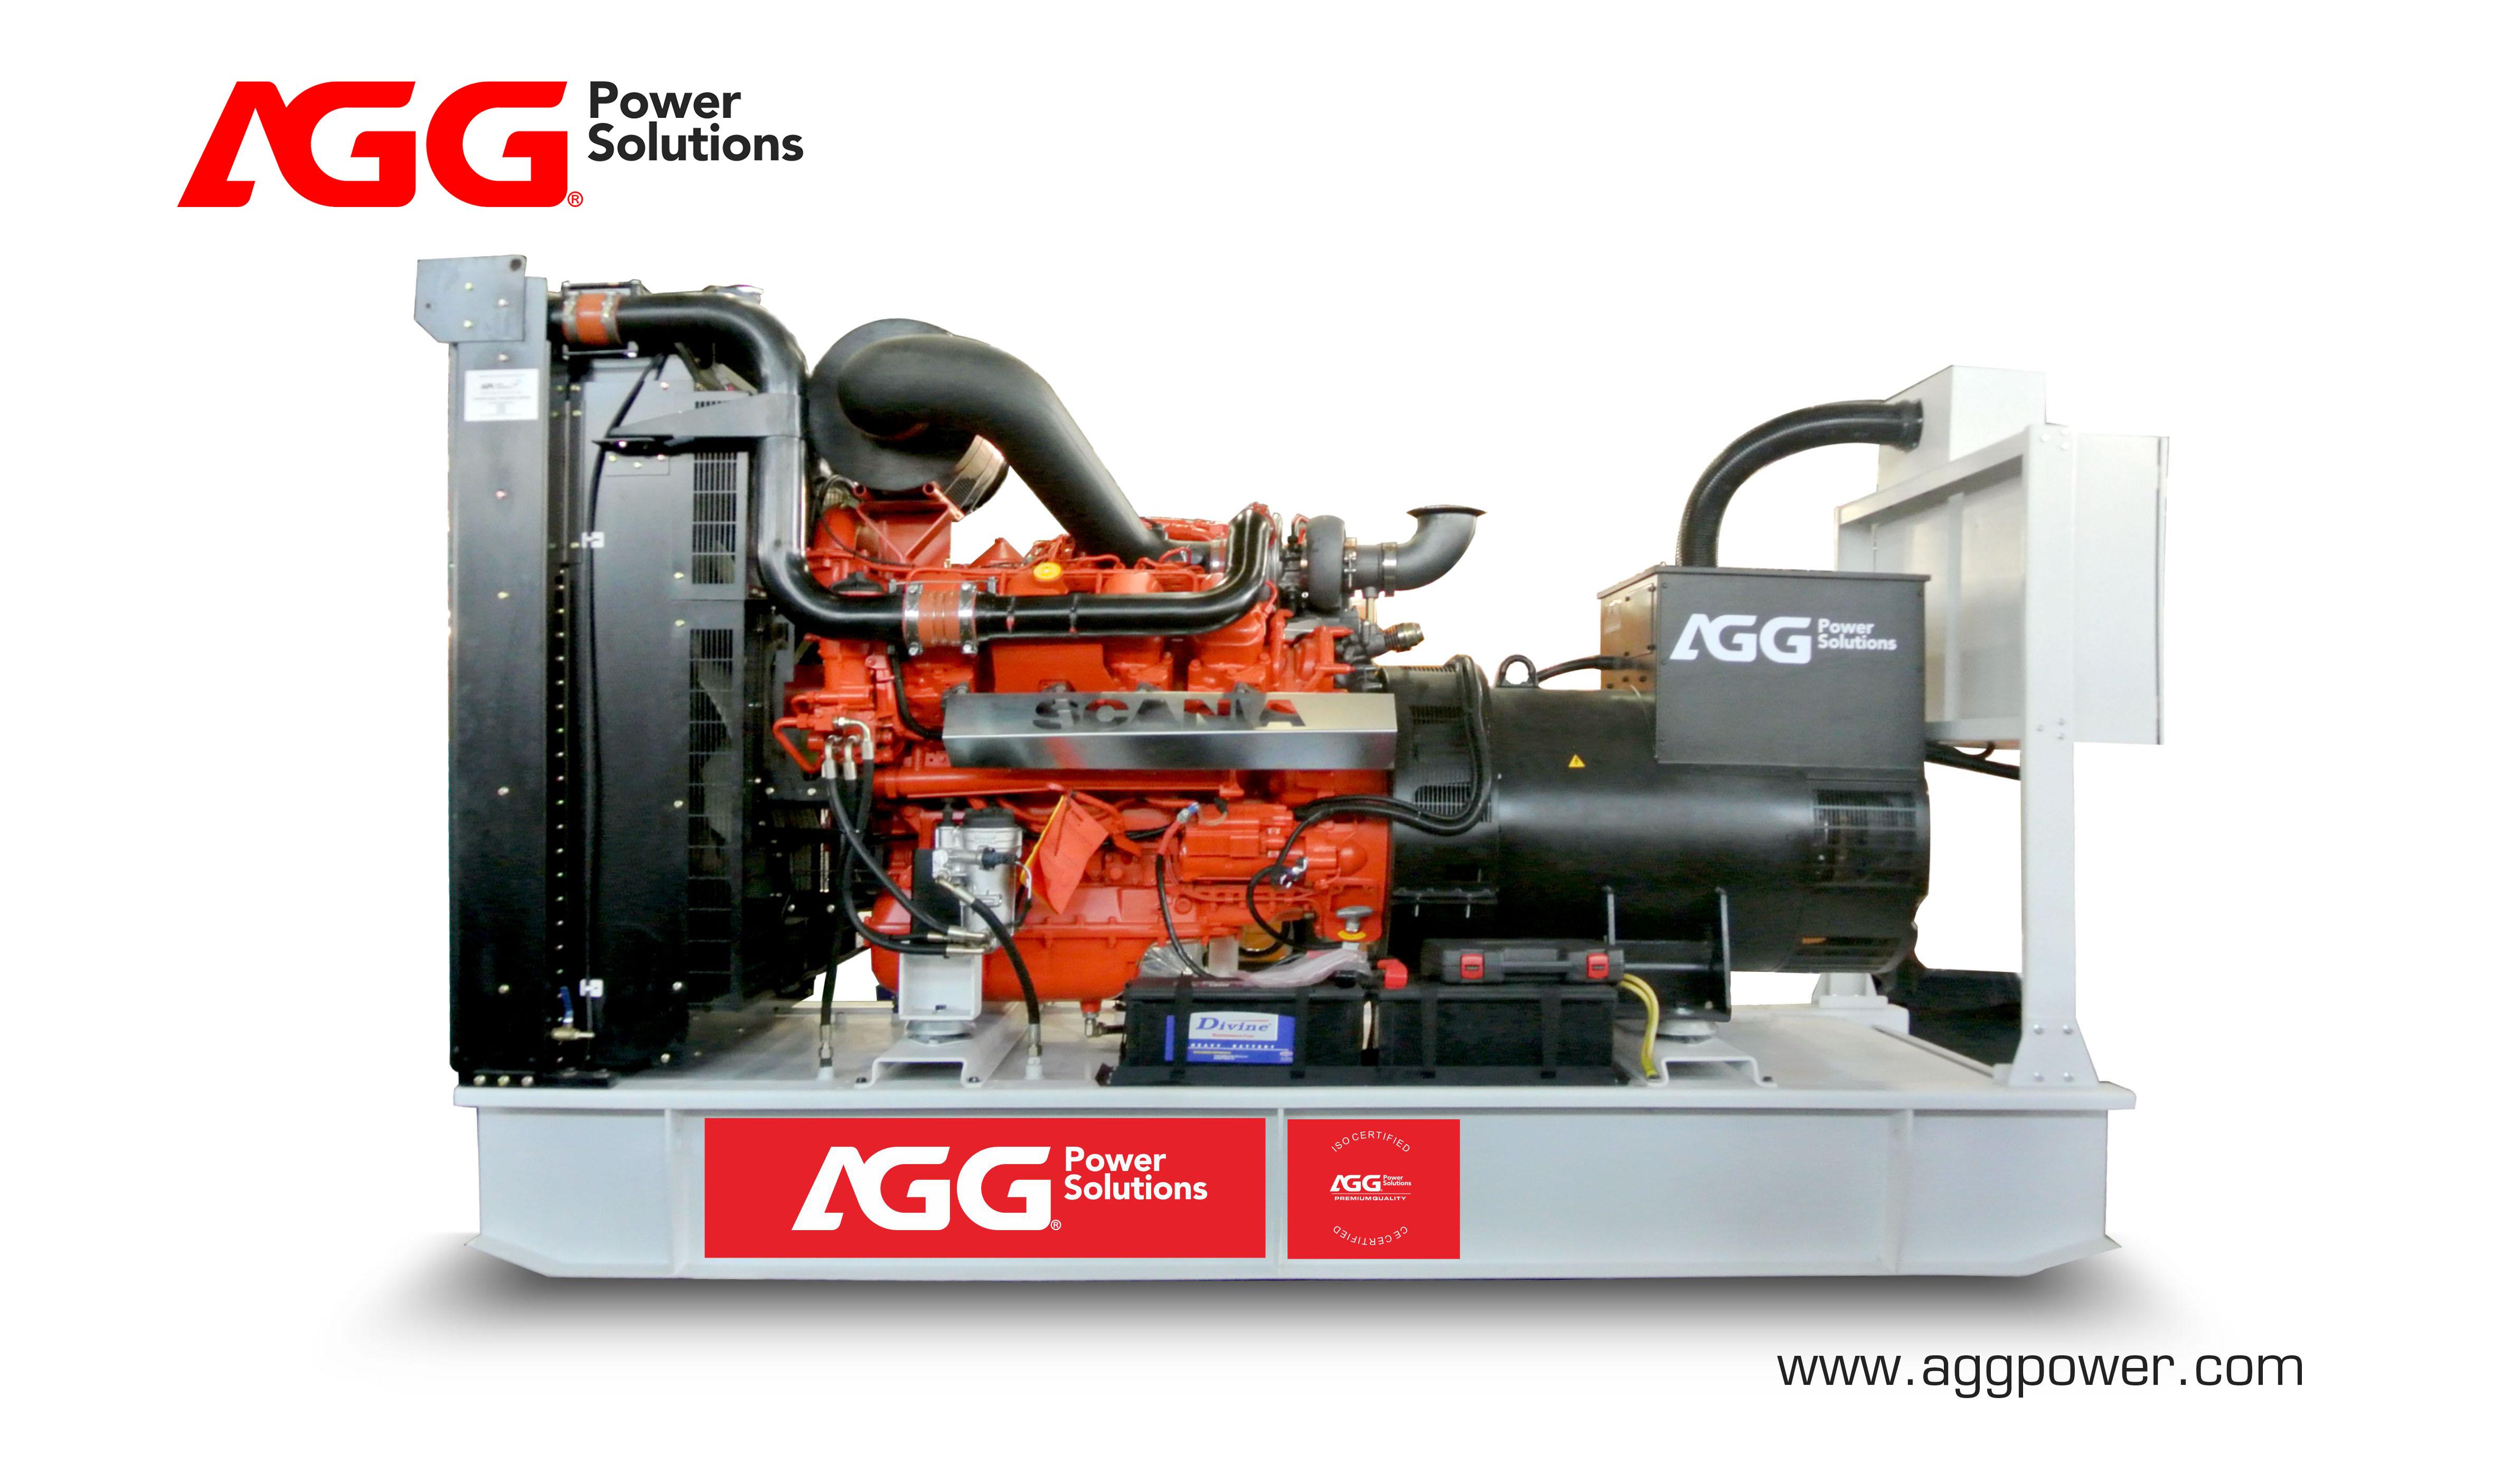 AGG Scania diesel generator